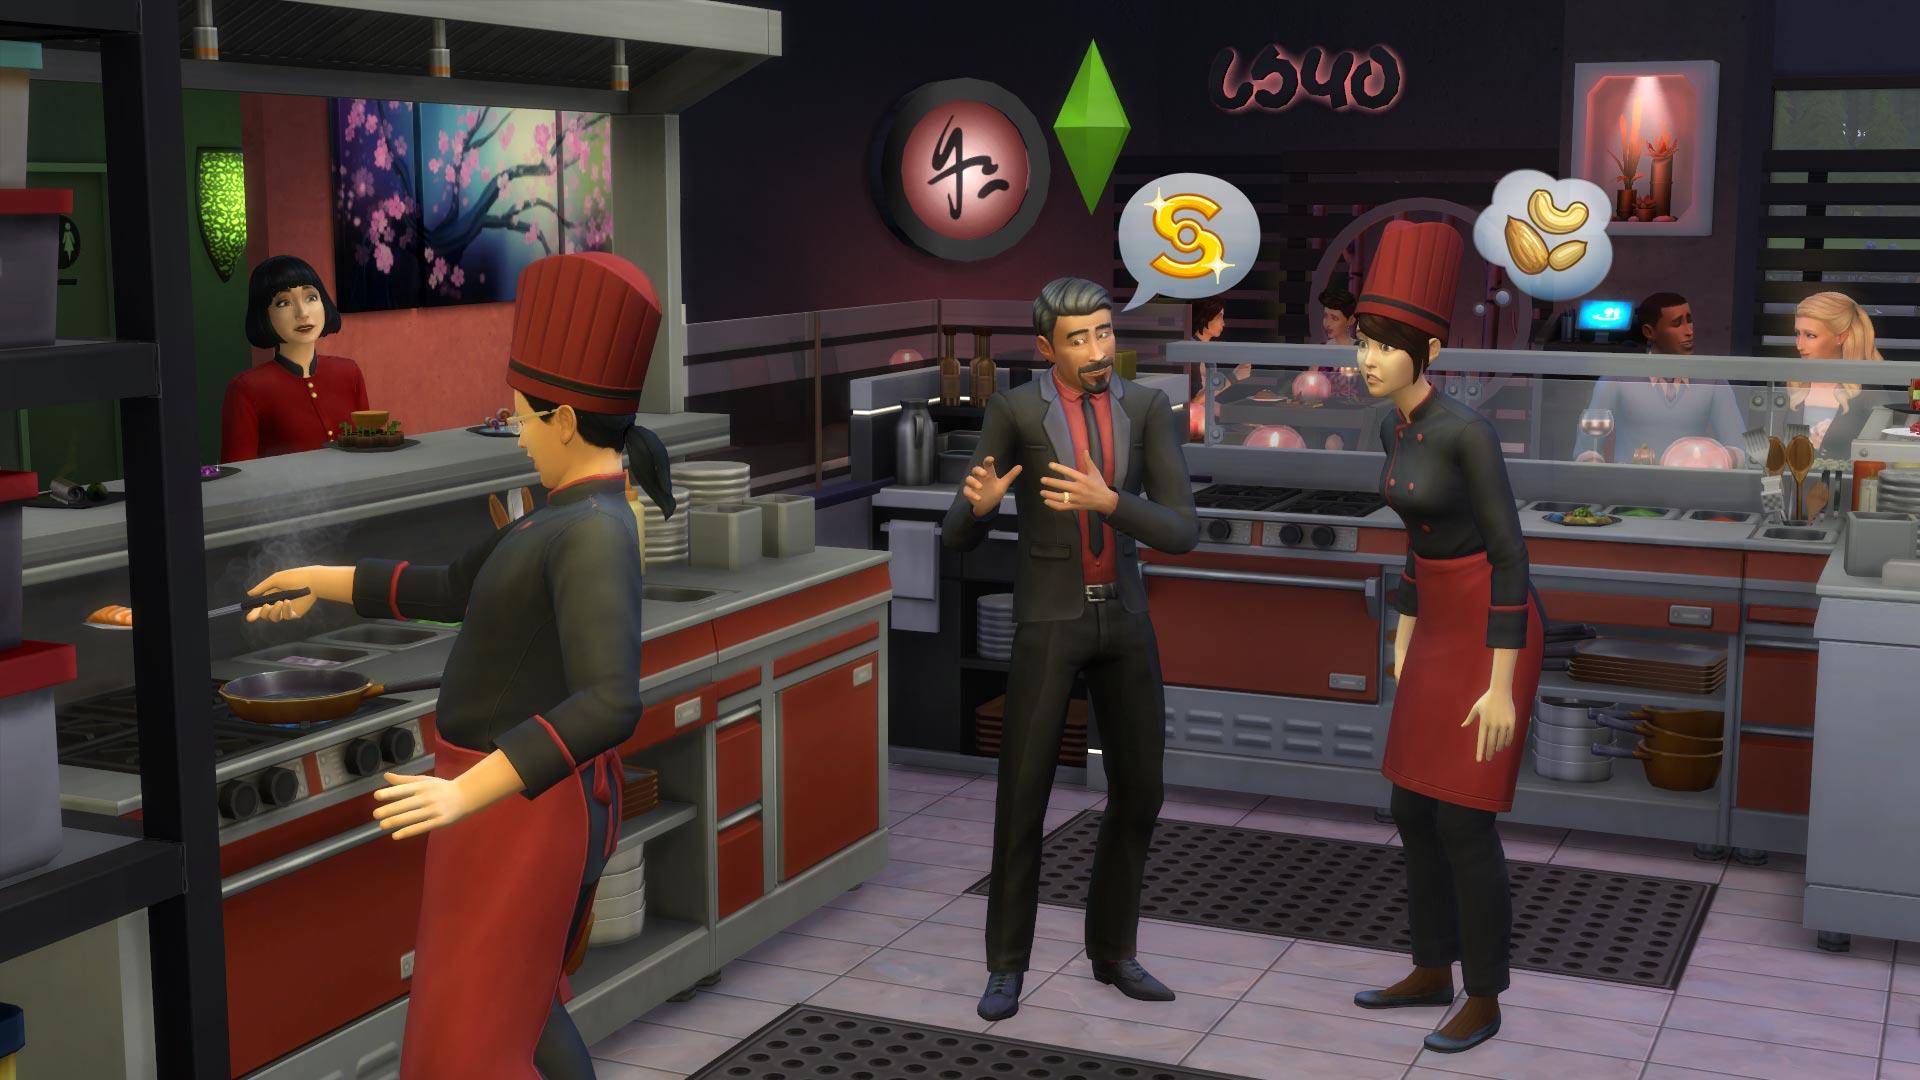 Los Sims 4 pantalla Escapada Gourmet